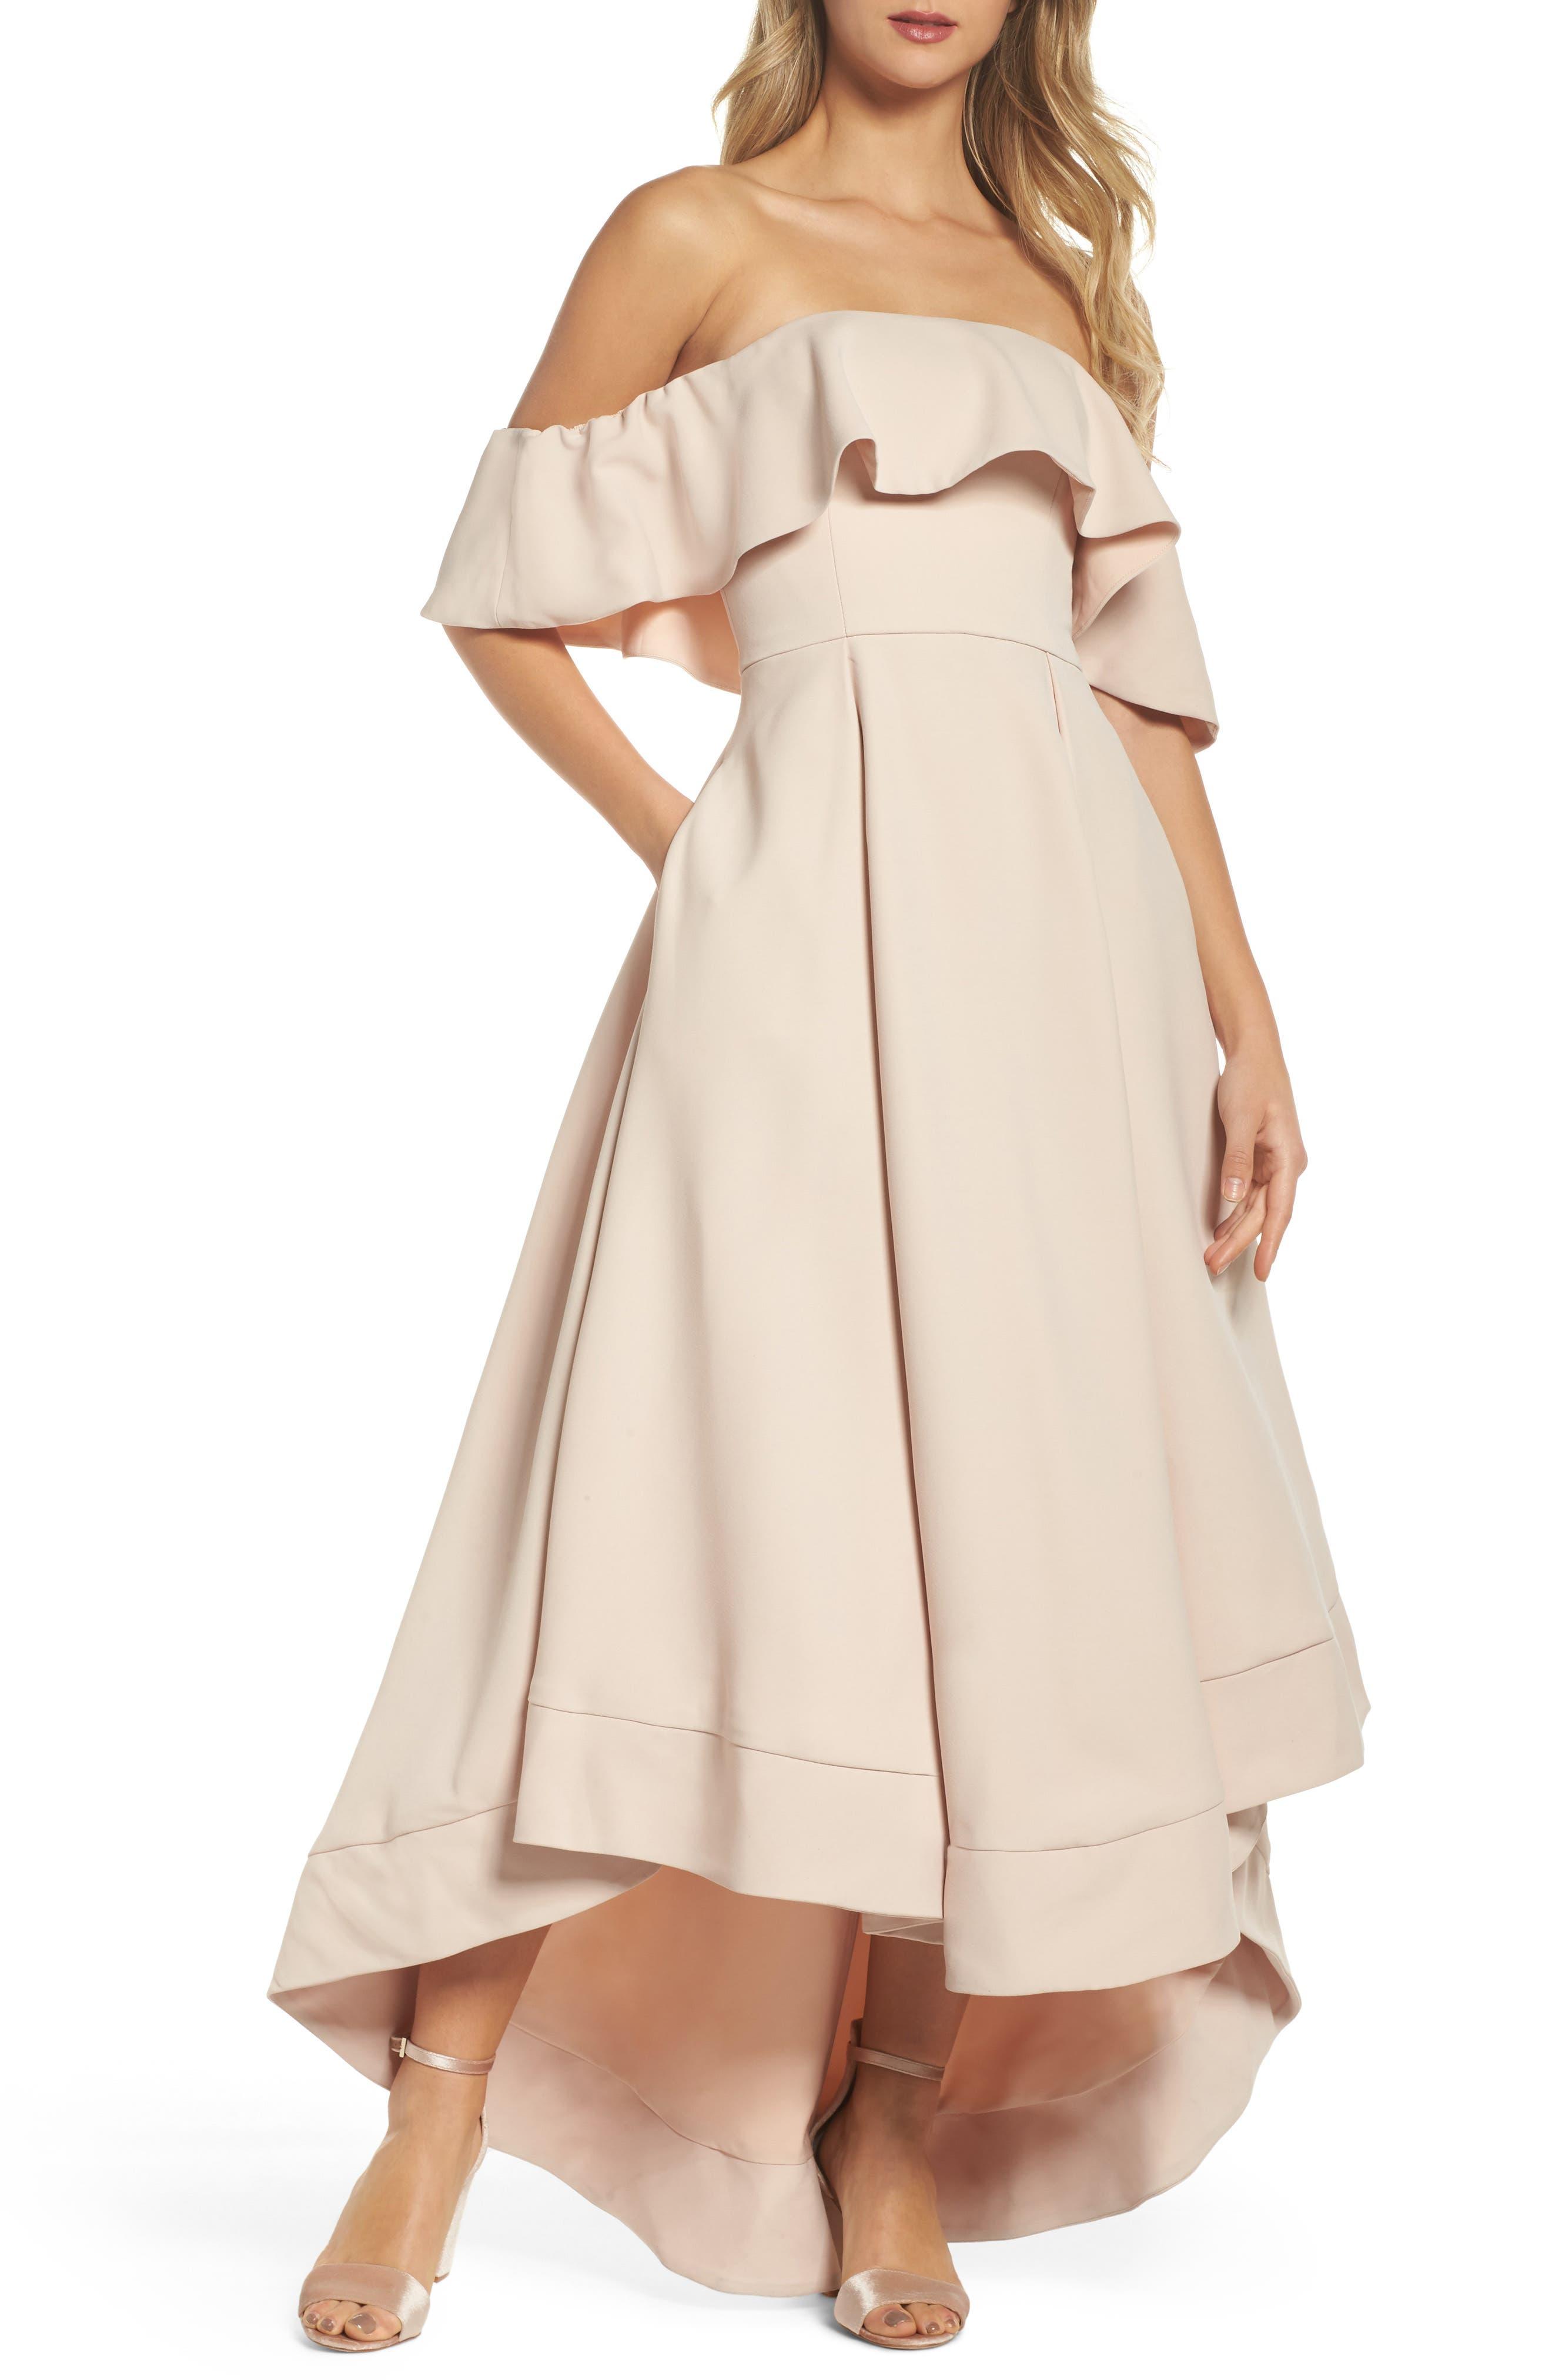 Temptation Off the Shoulder Ballgown,                         Main,                         color, Blush